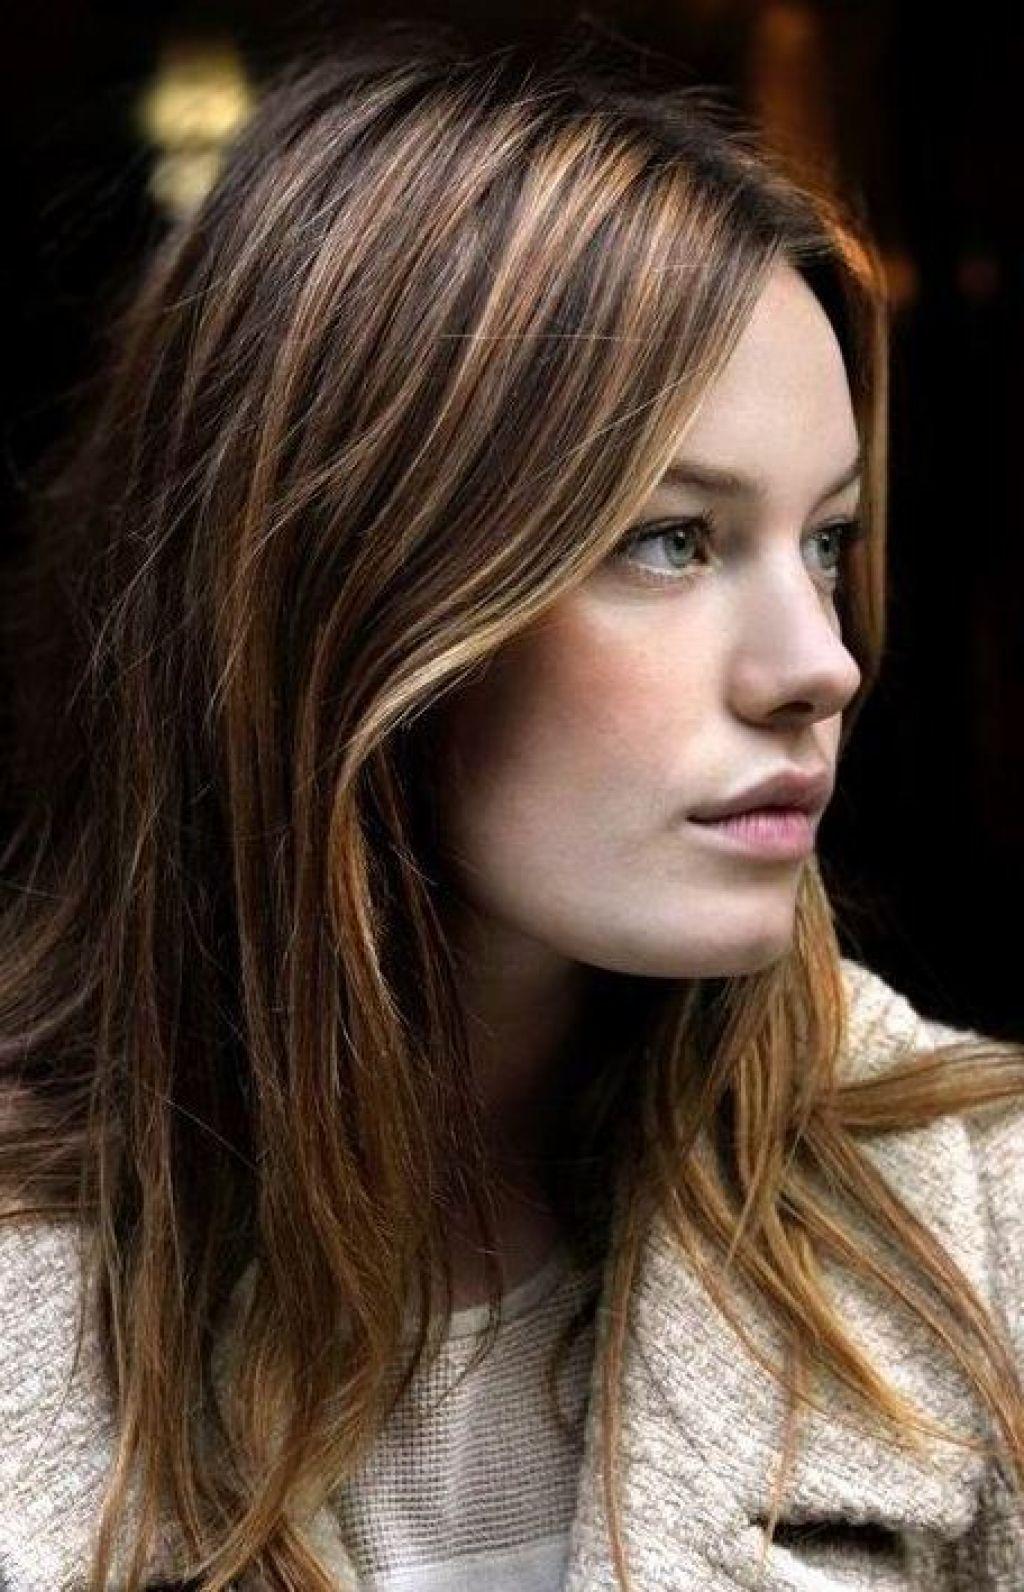 Natural Red Hair Dye For Long Hair Hair And Make Up Pinterest